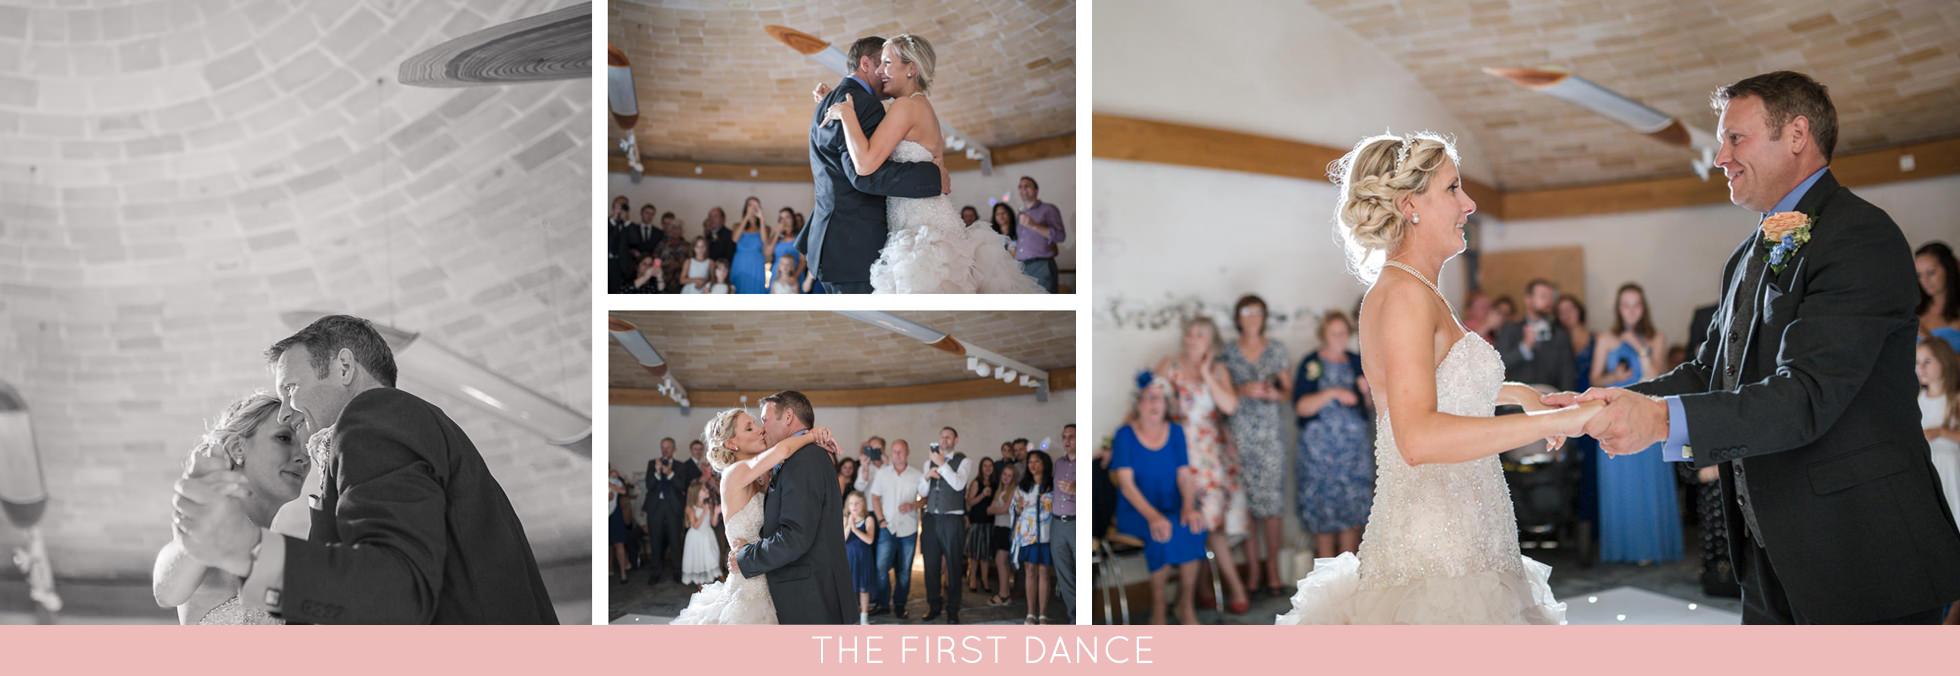 first dance wedding pines calyx